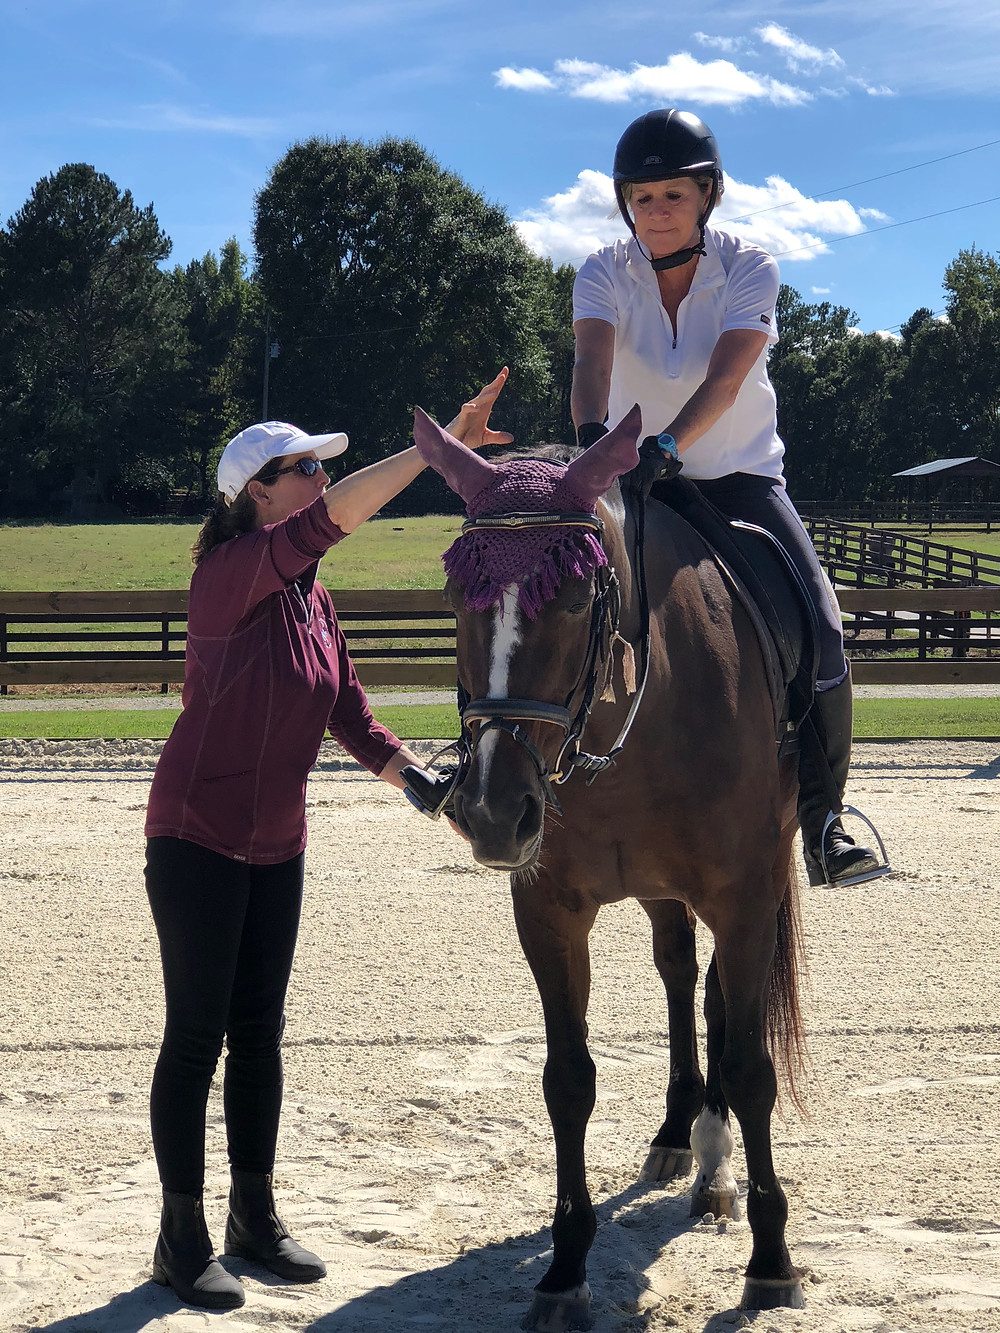 Catherine Hunter of Sacred Connections Horsemanship adjusting a rider's position.